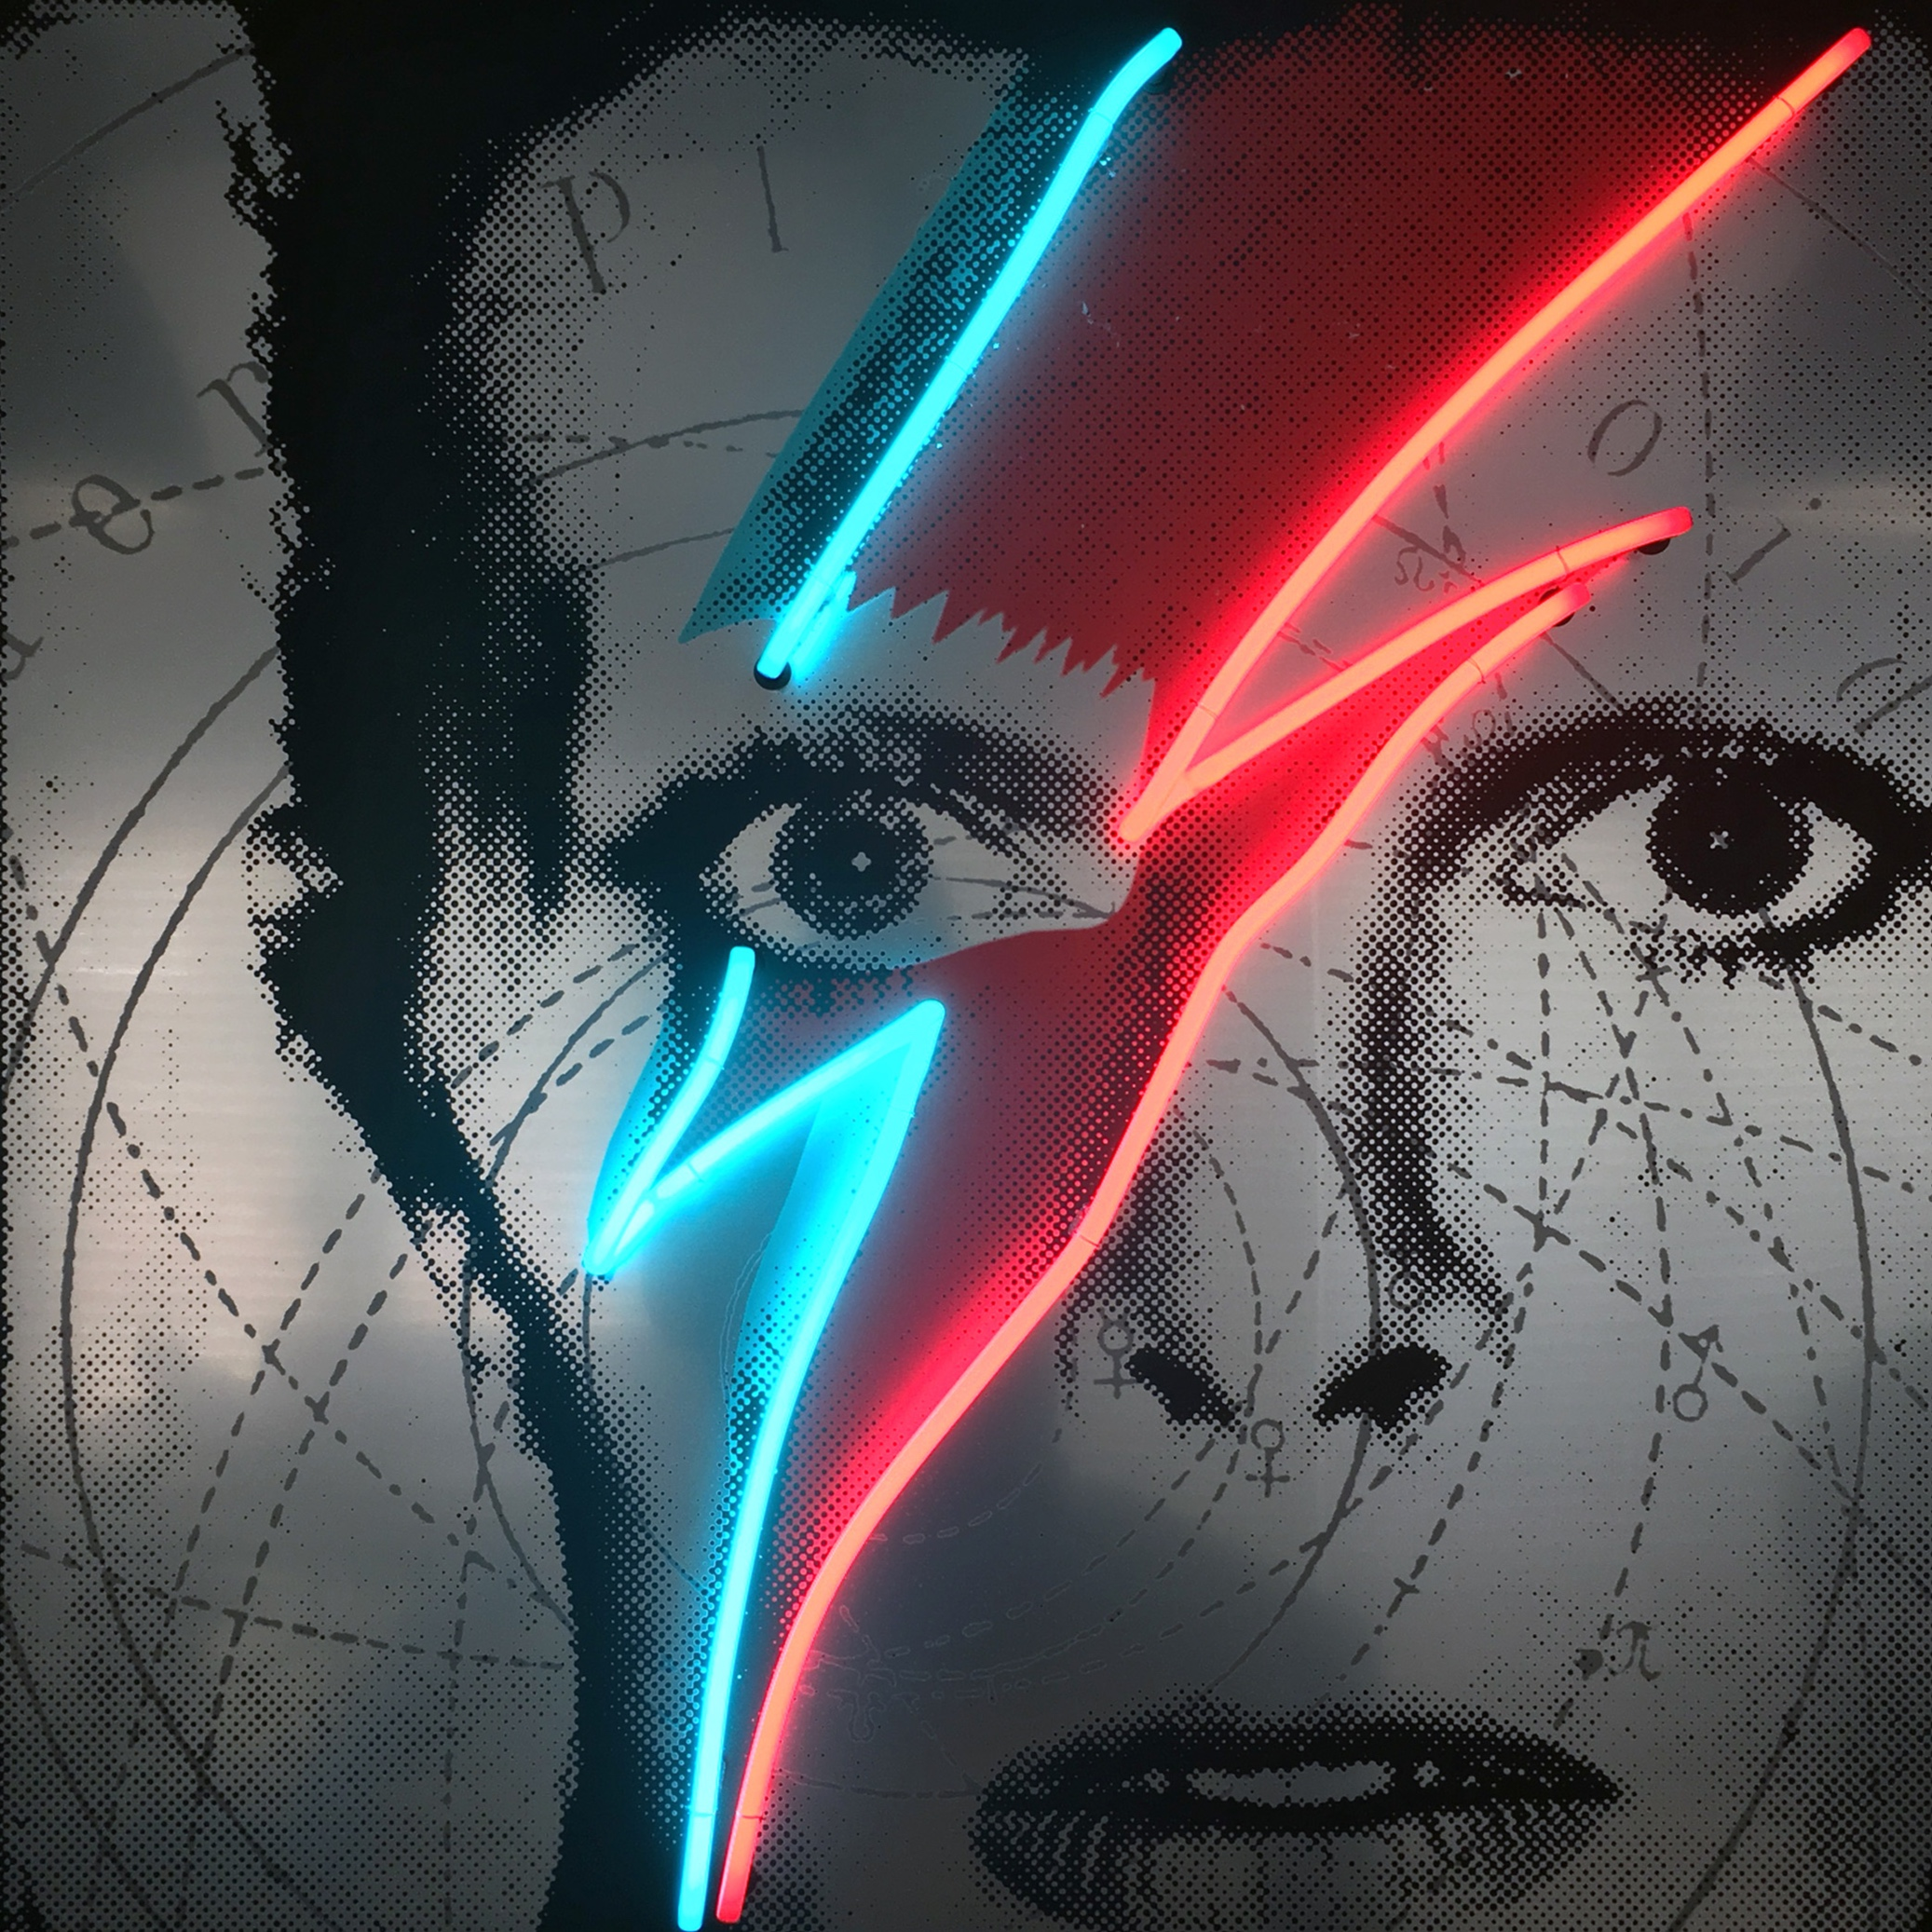 louis+sidoli+neon+art+starman+1.jpg